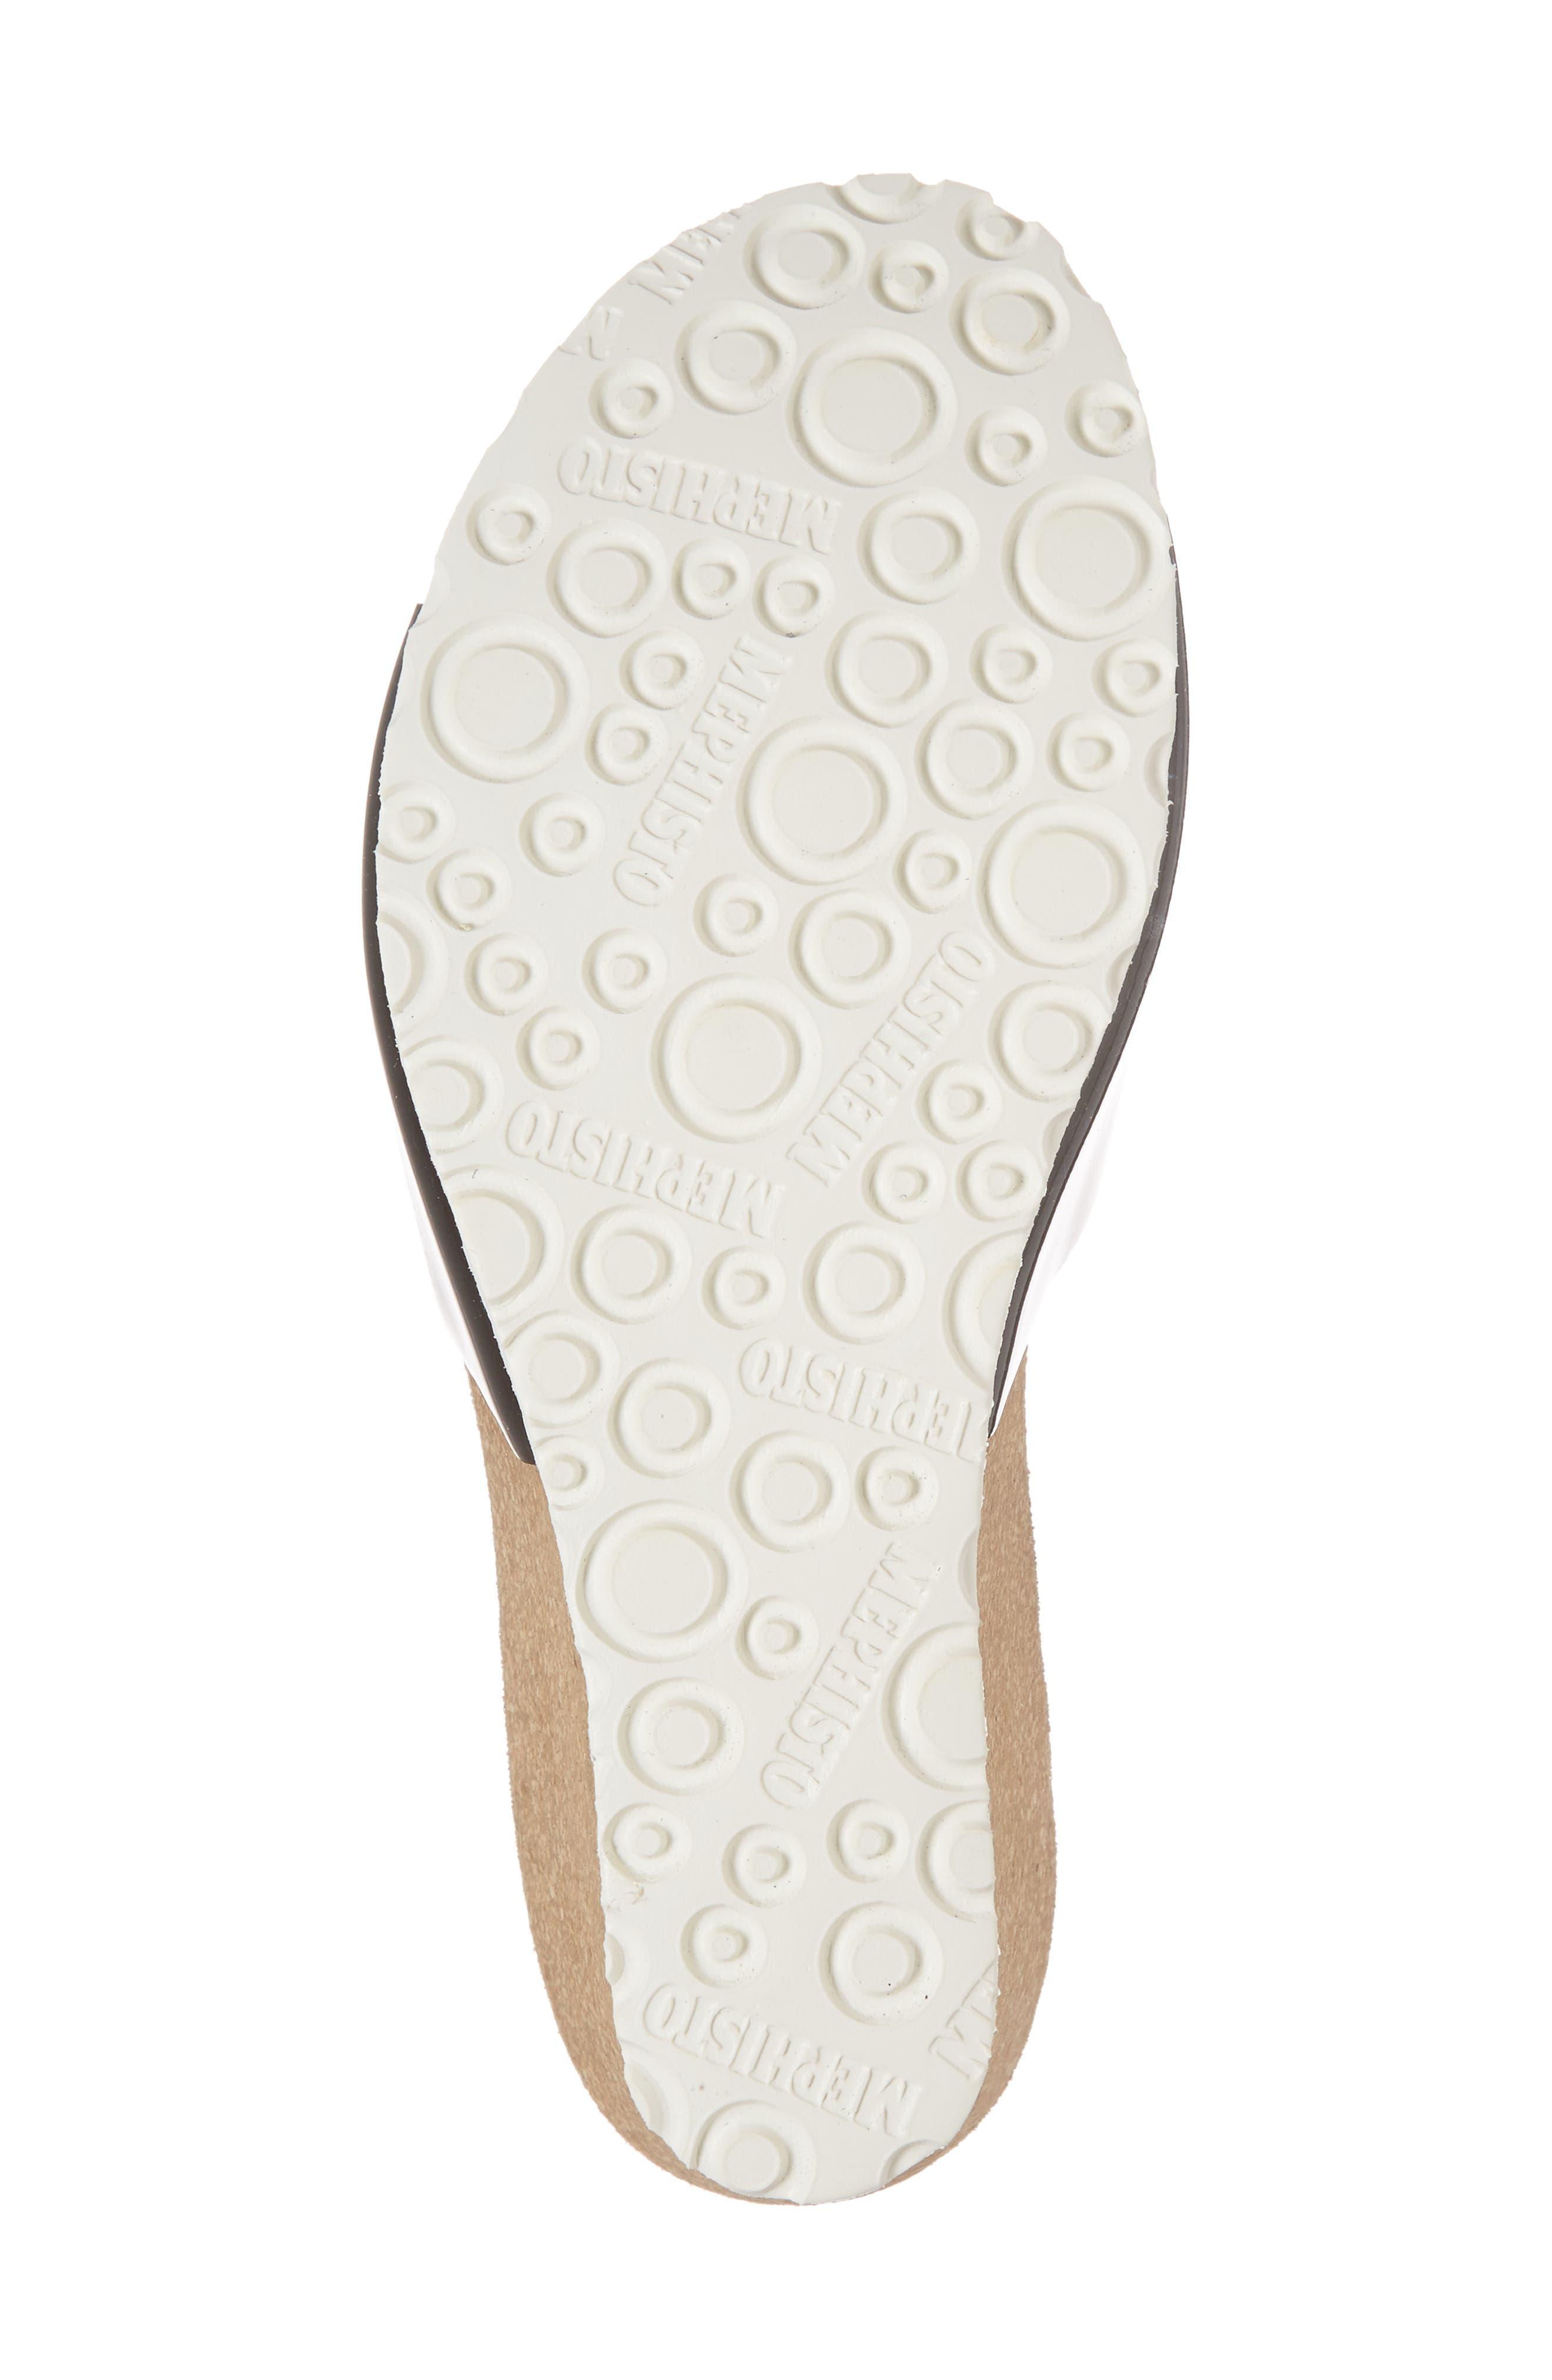 Lise Platform Wedge Sandal,                             Alternate thumbnail 6, color,                             Black